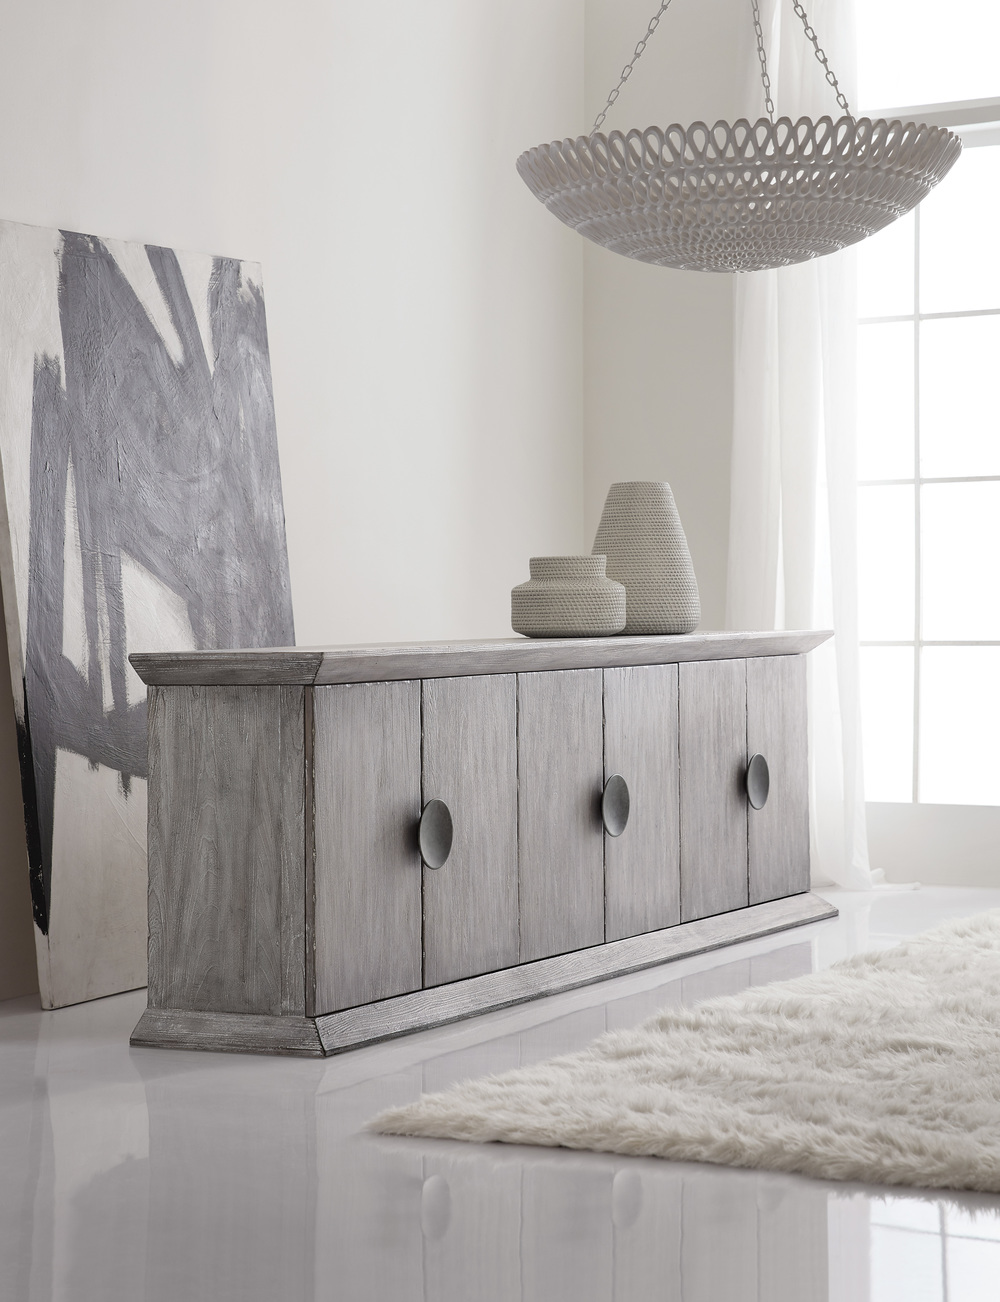 Hooker Furniture - Koren Credenza